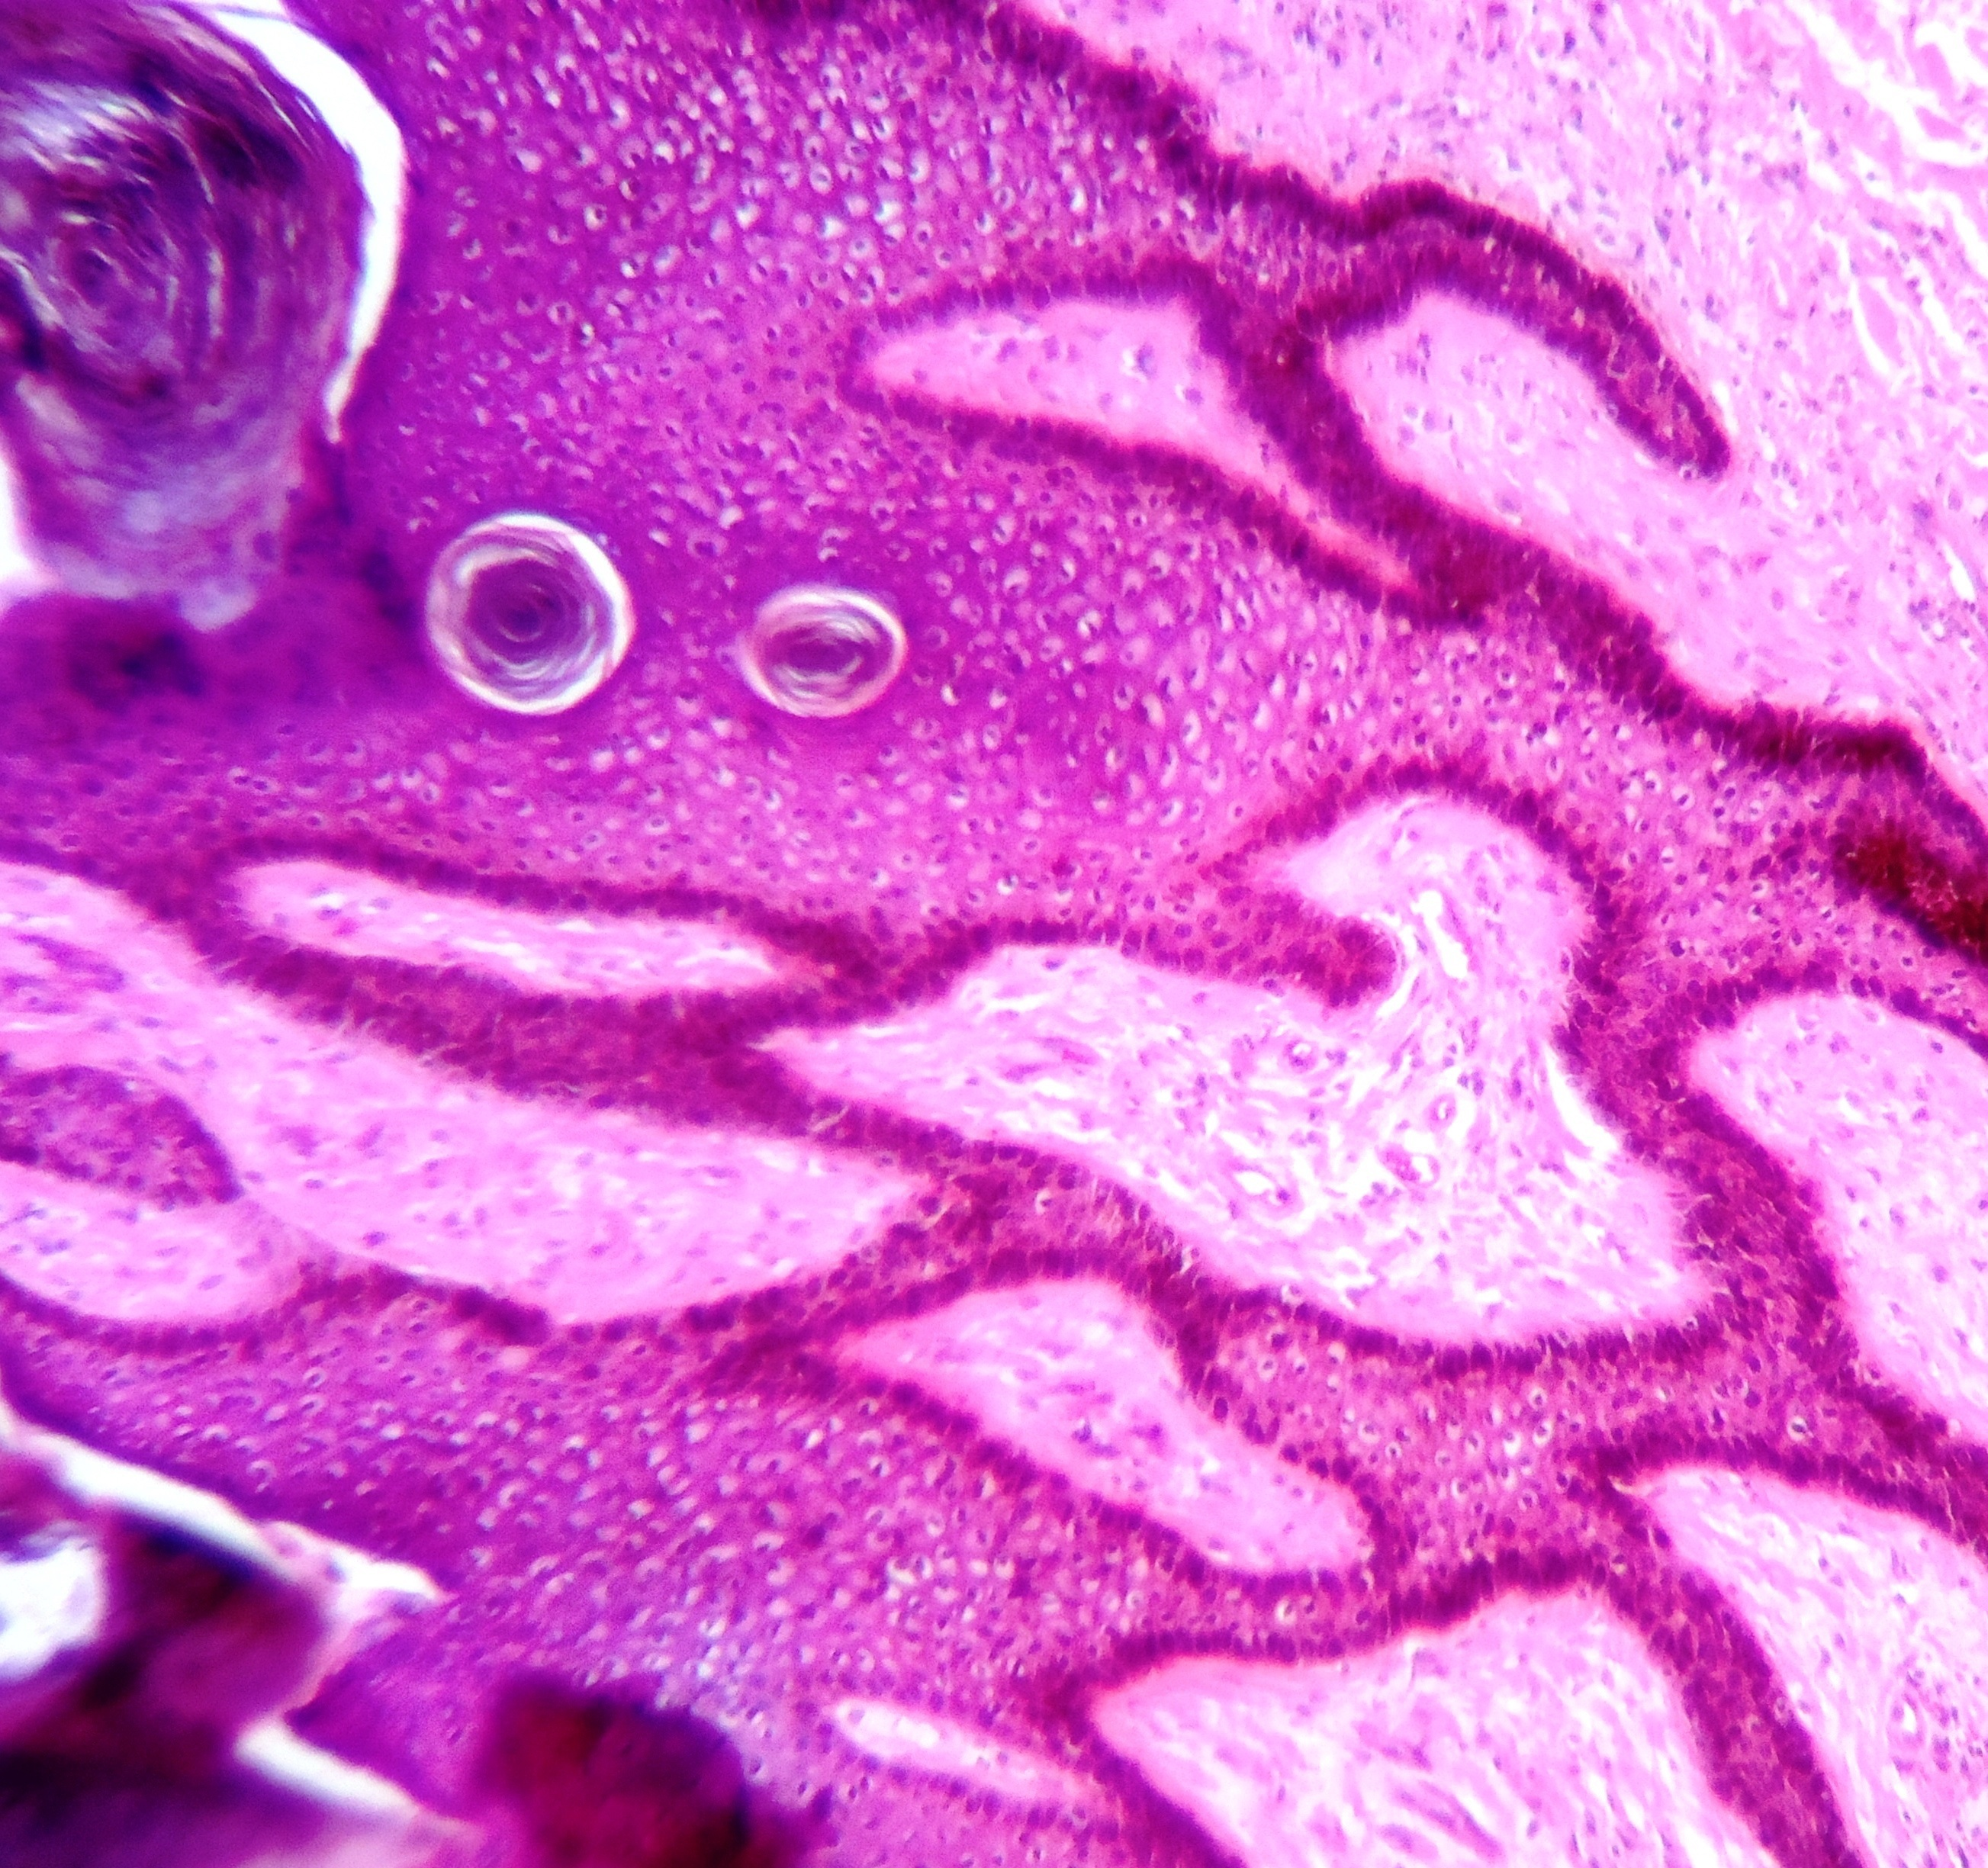 Condyloma acuminata histopathology. Predescu Anca-Mihaela - Referințe bibliografice Google Academic